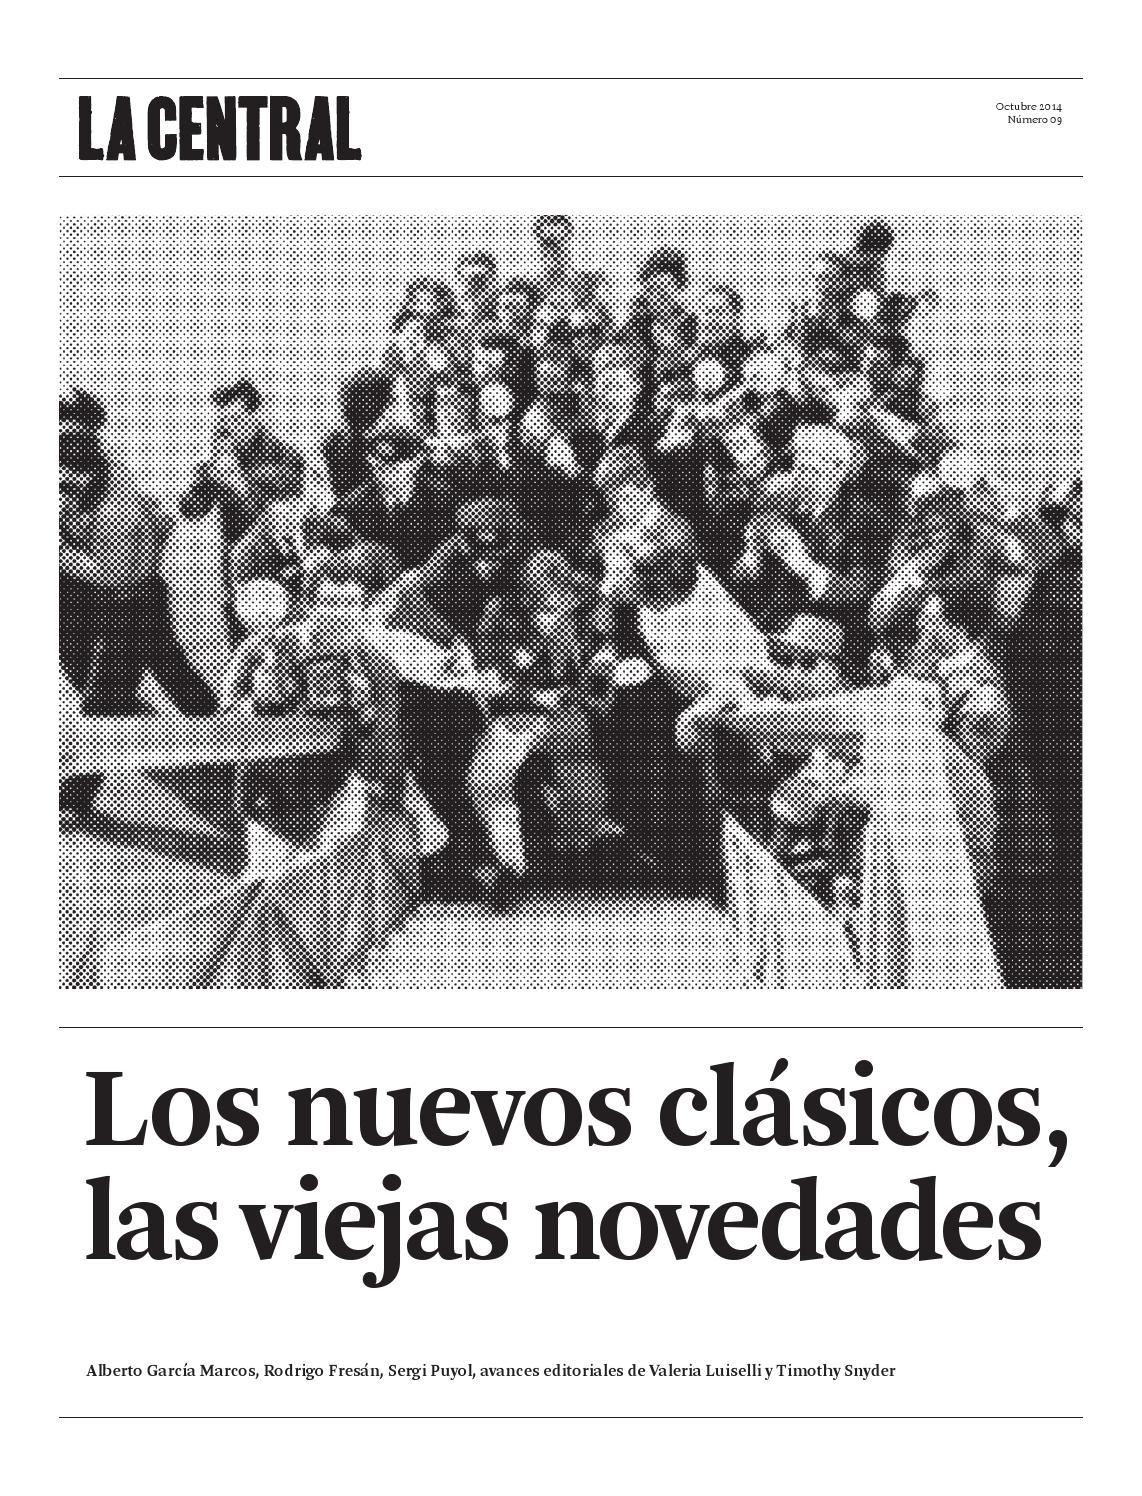 Periódico La Central. Octubre 2014 by webmaster LaCentral - issuu